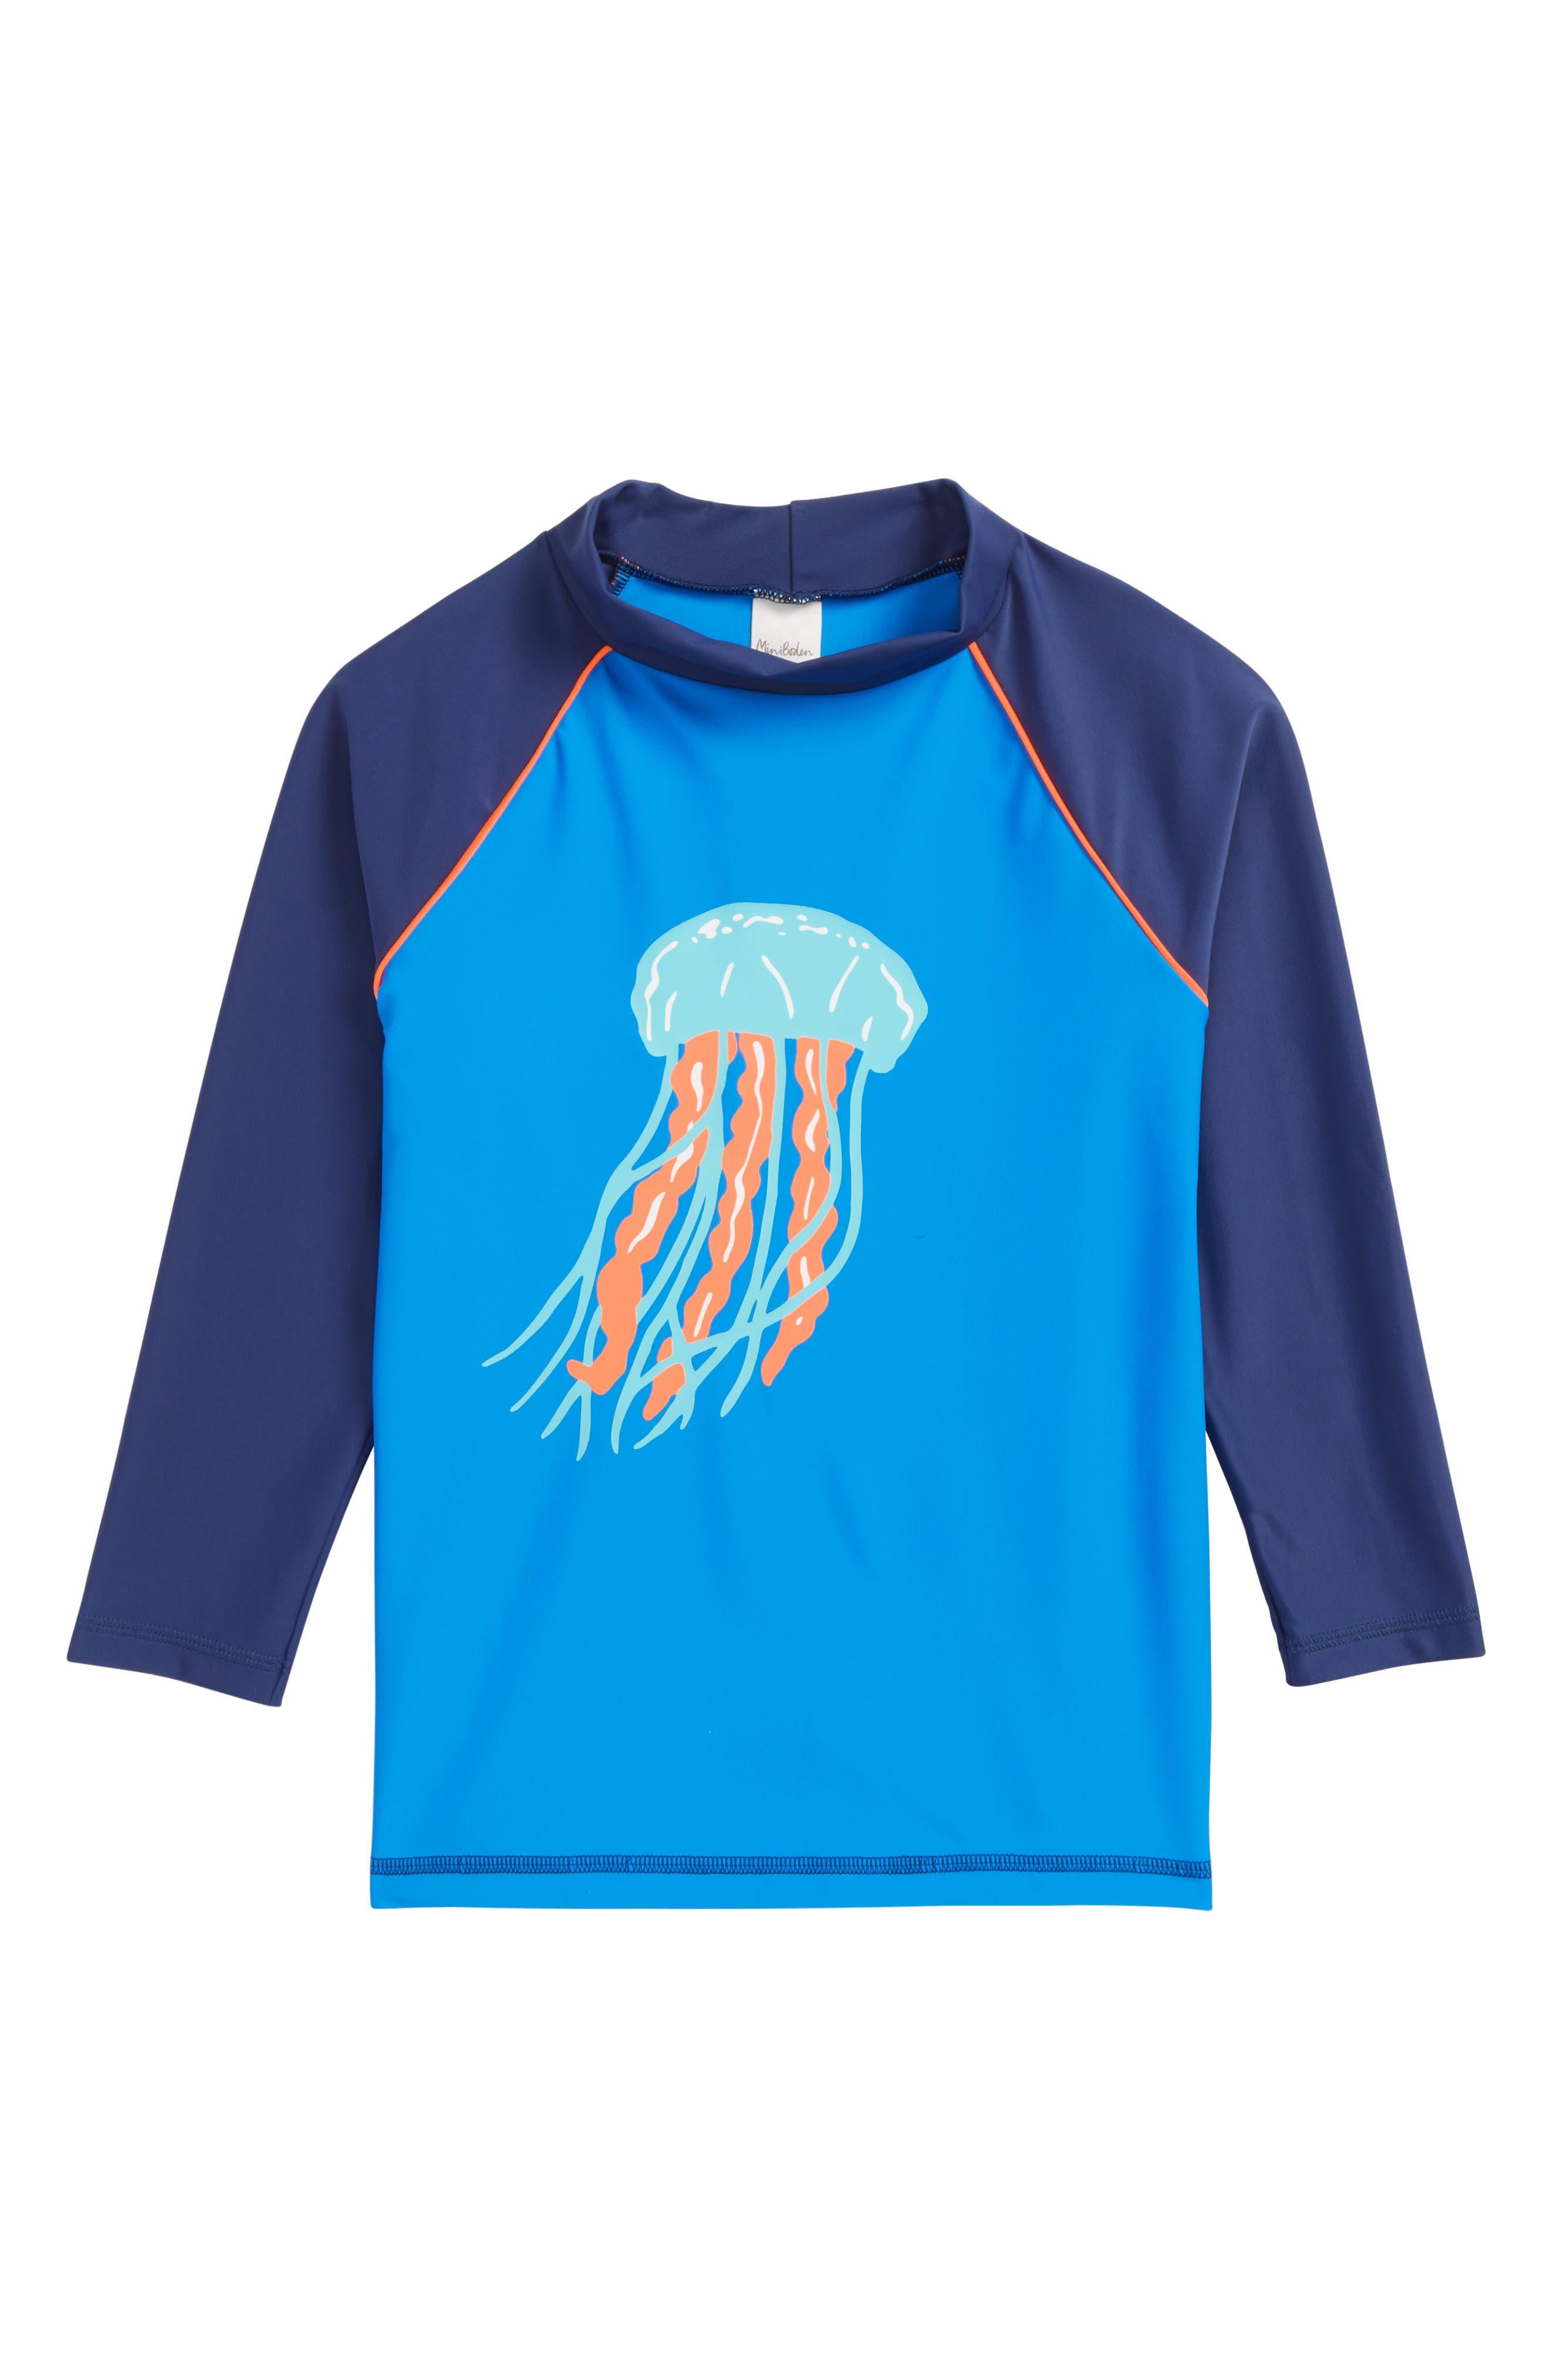 Jellyfish Rashguard,                         Main,                         color, Pool Blue Jelly Fish